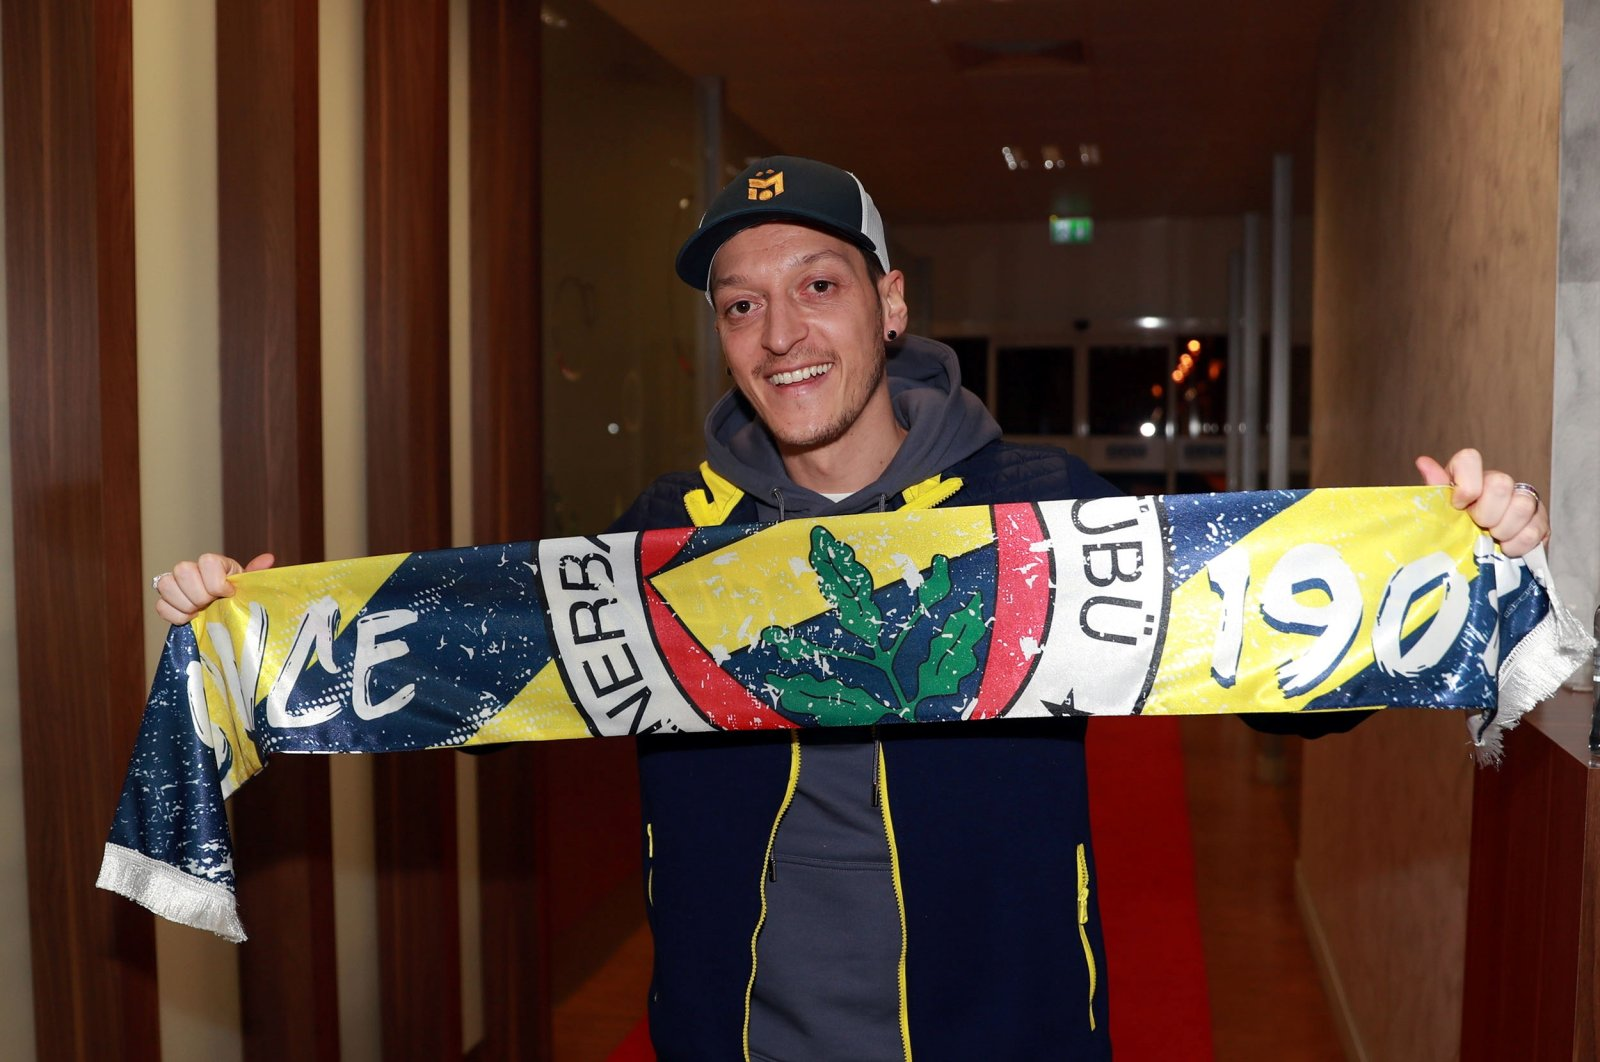 German-Turkish midfielder Mesut Özil poses with a Fenerbahçe scarf upon his arrival at Atatürk Airport in Istanbul, Turkey, Jan. 18, 2021. (Reuters Photo)